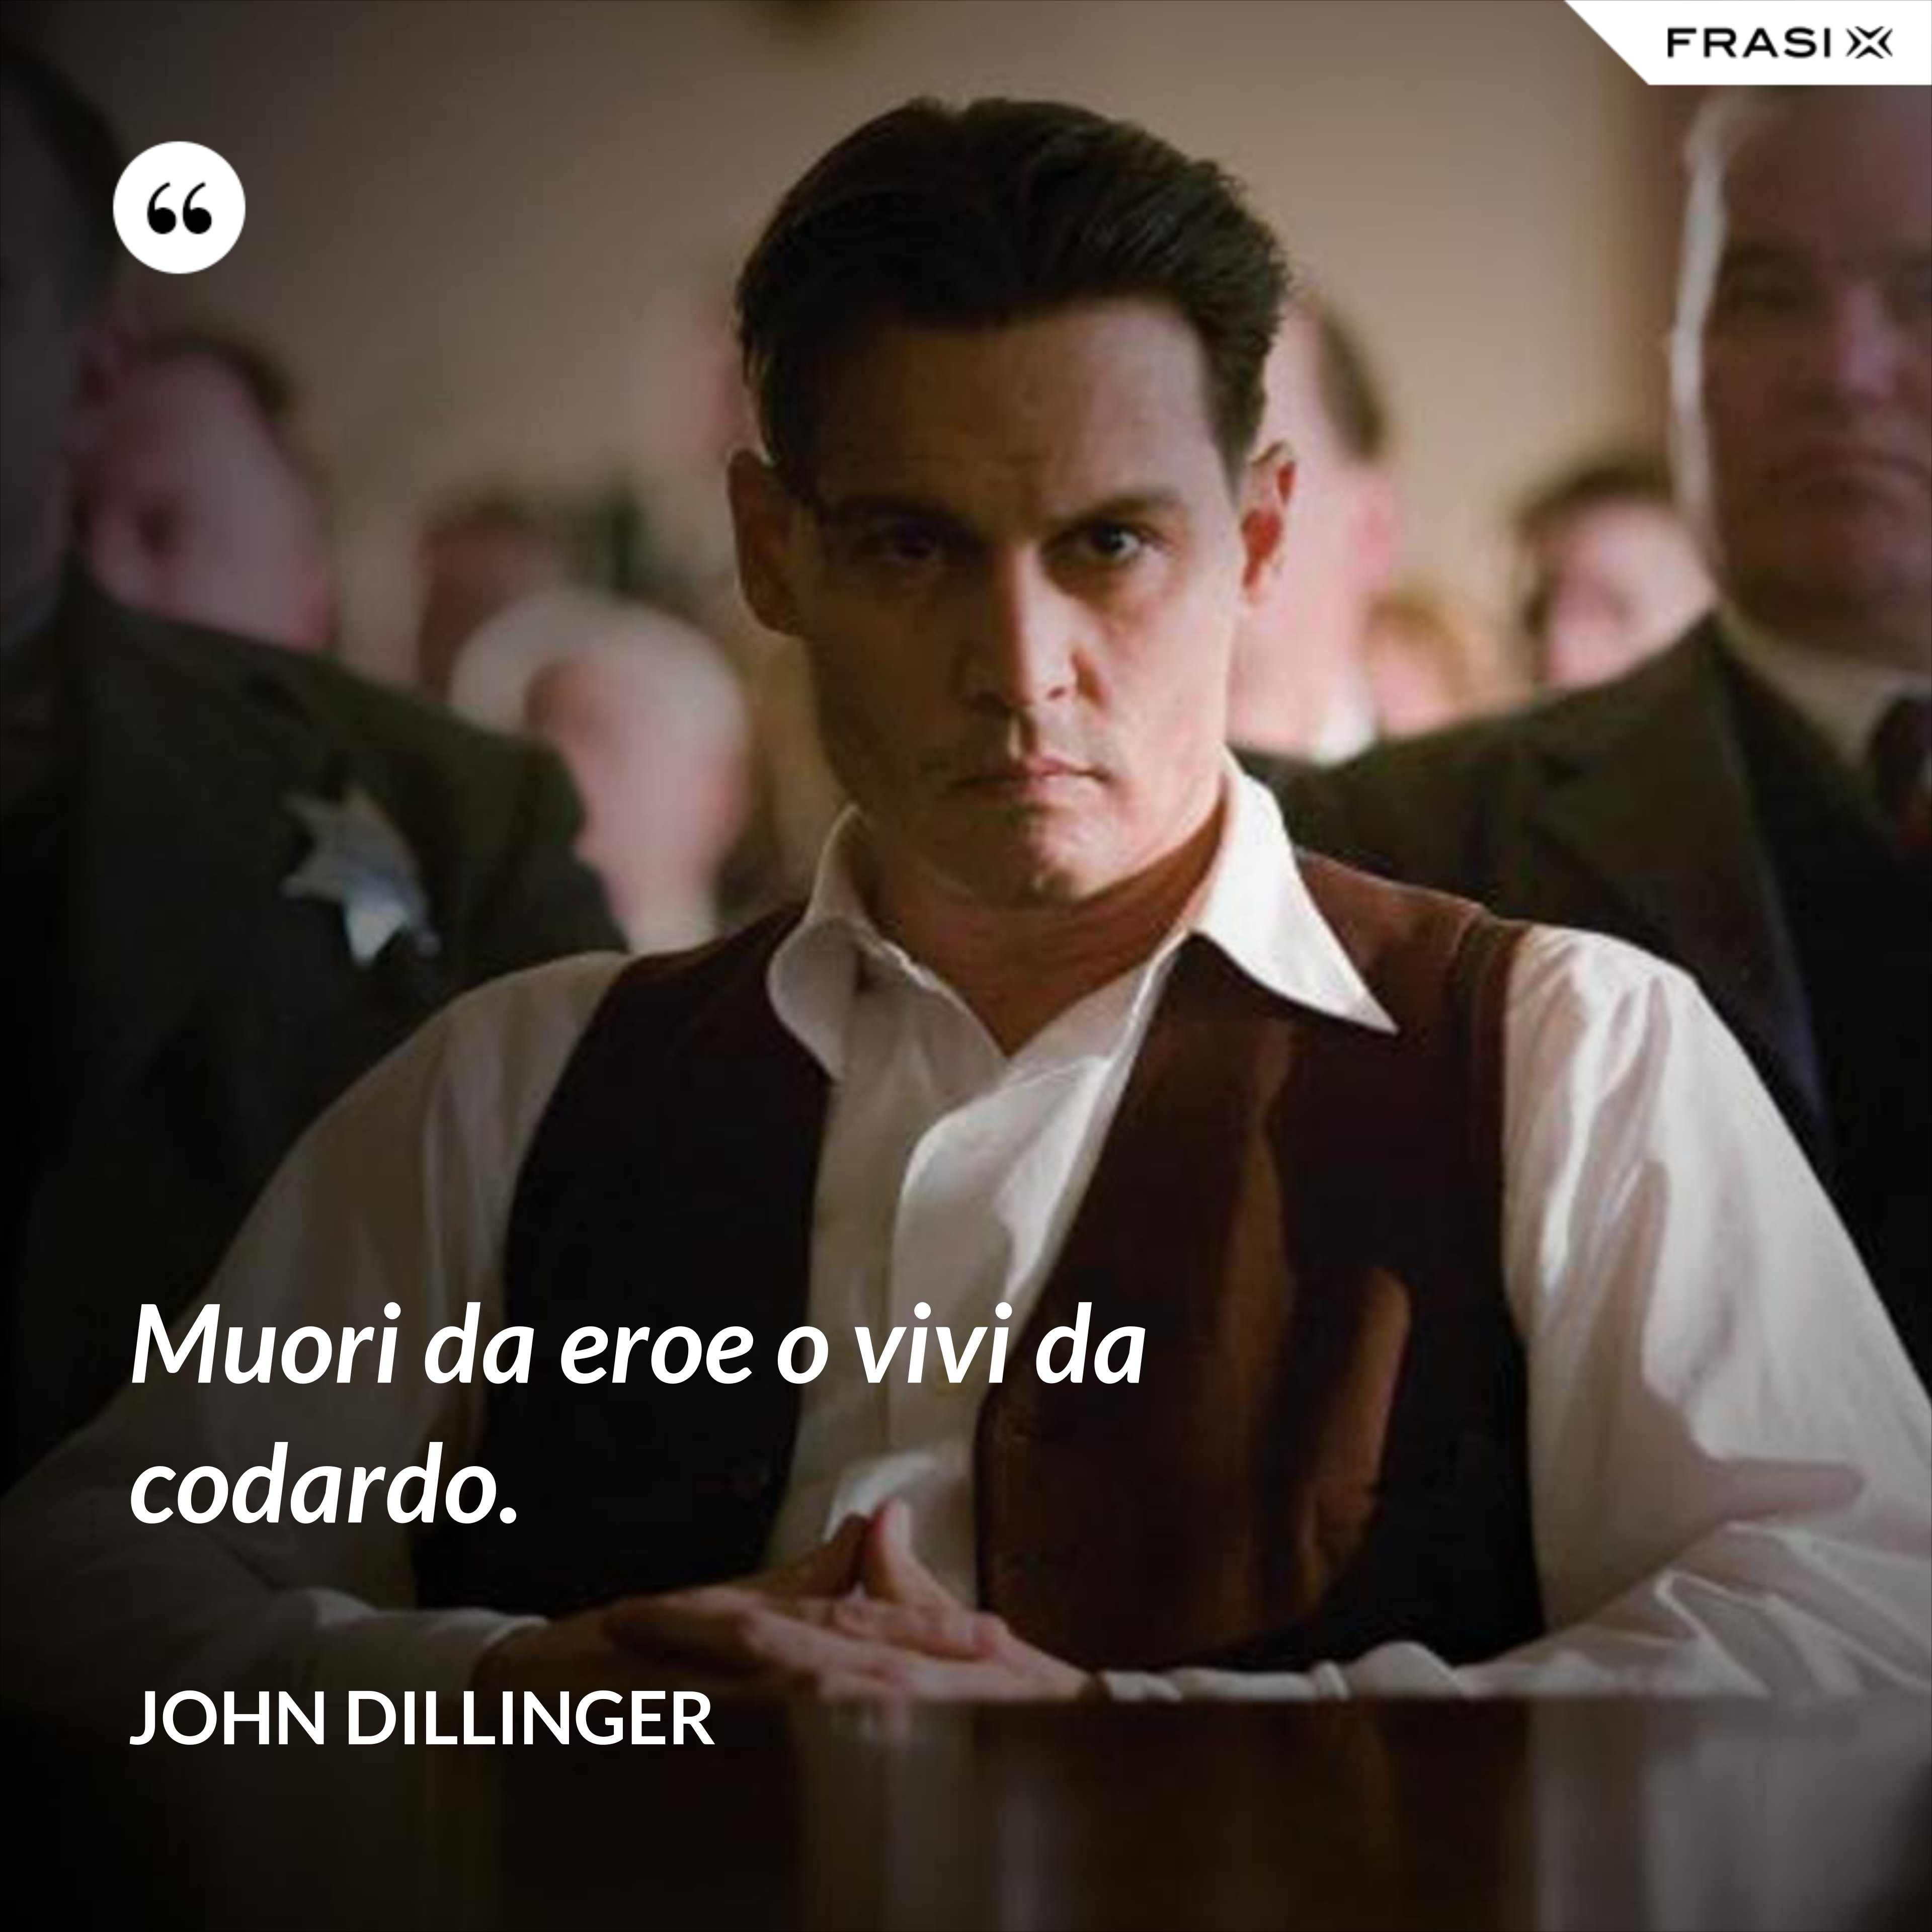 Muori da eroe o vivi da codardo. - John Dillinger